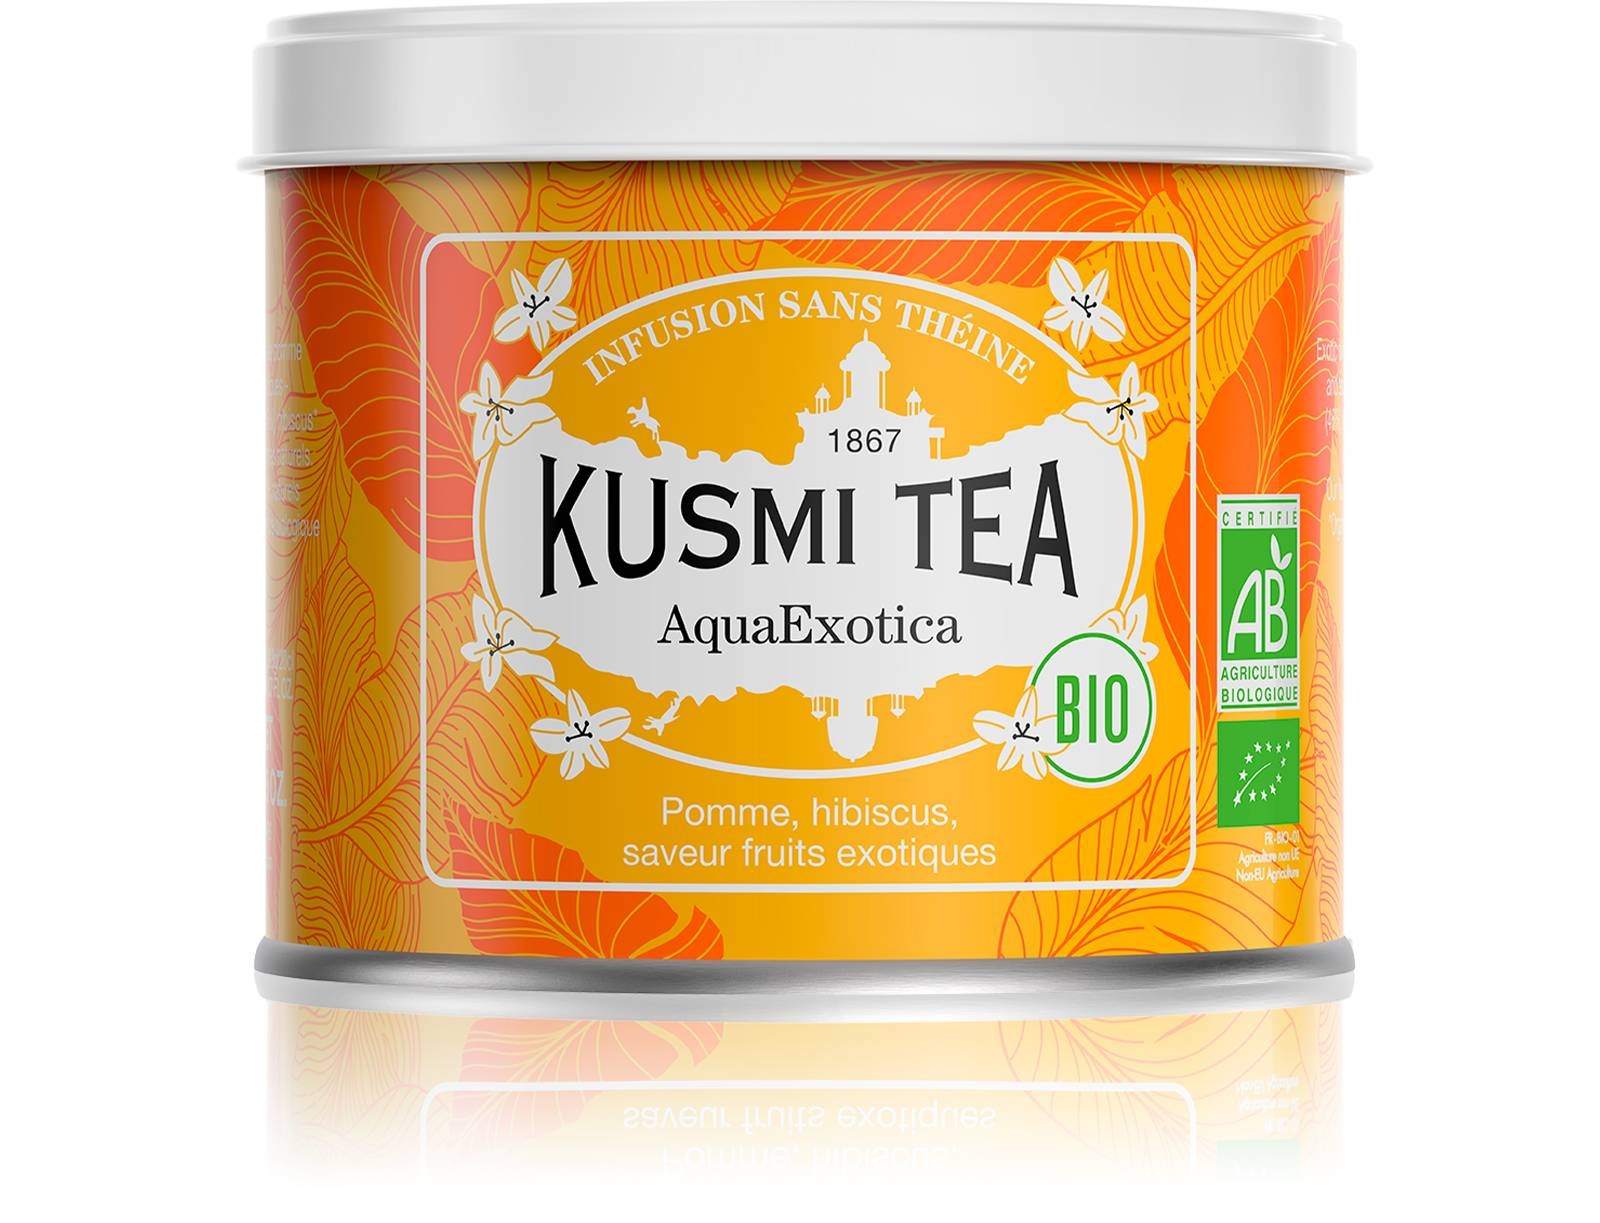 KUSMI TEA AquaExotica (Infusion de fruits bio) Kusmi Tea